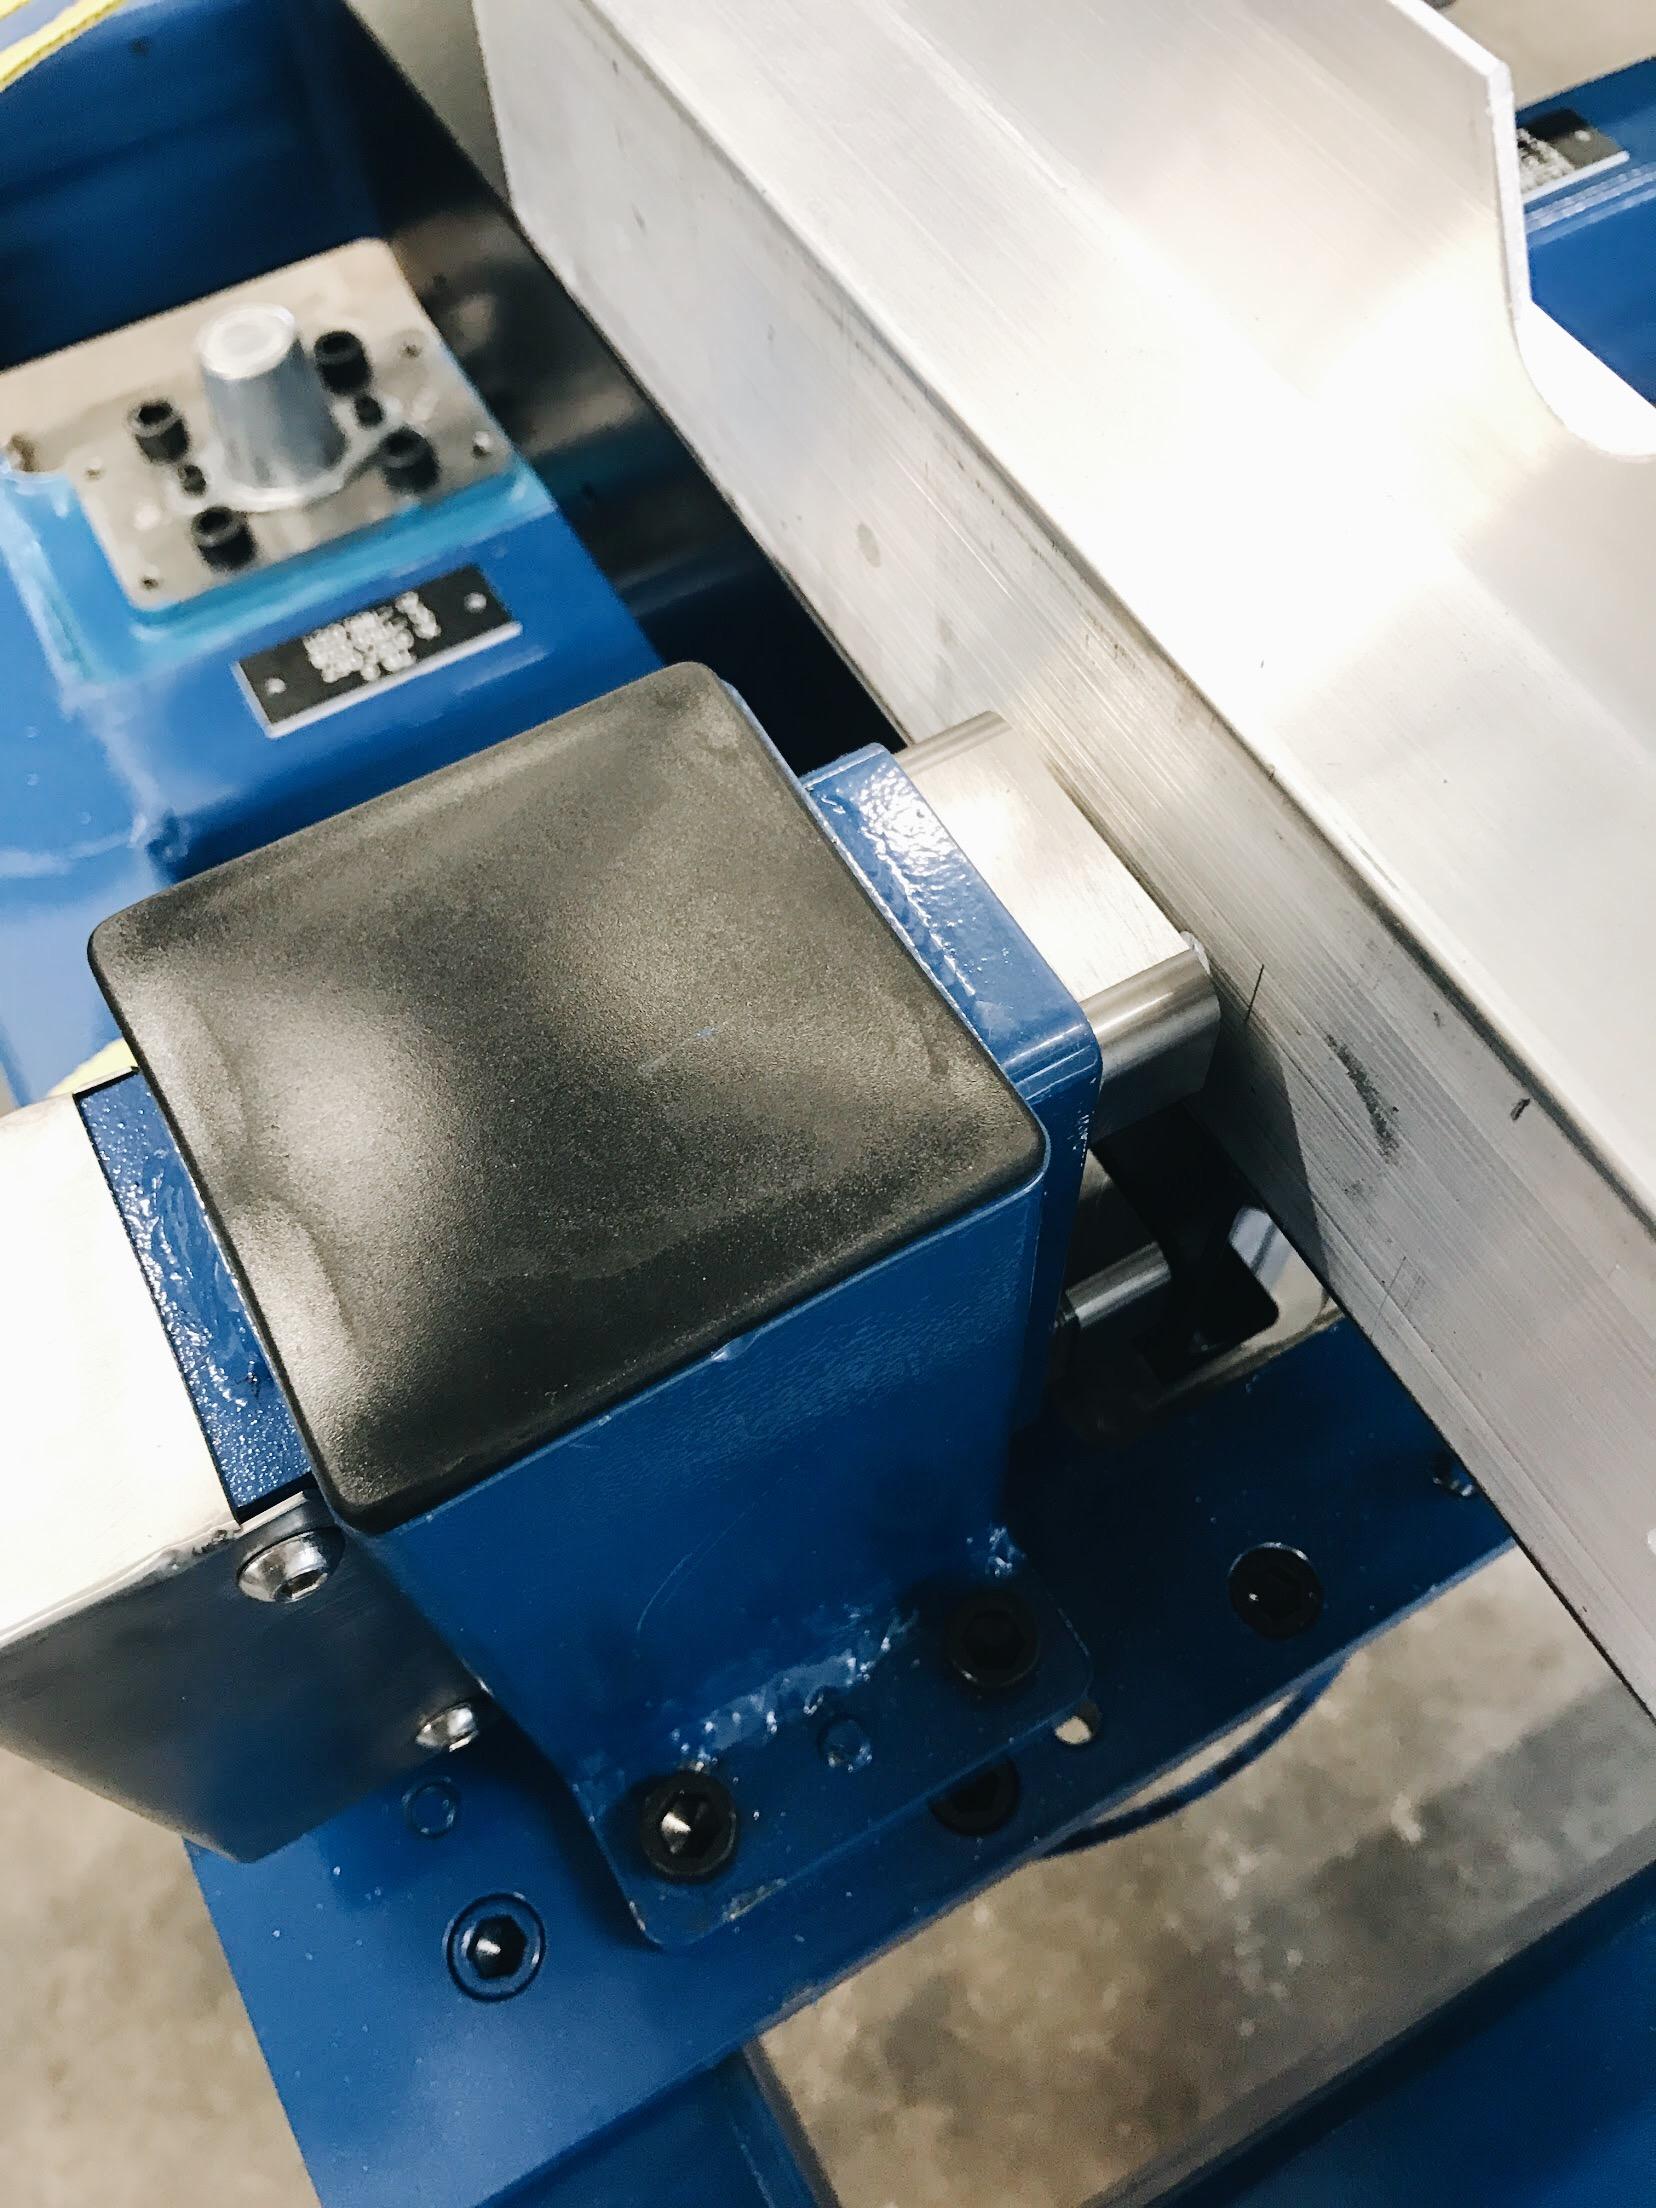 assembly fixtures texas industrial machine & design 10.jpg